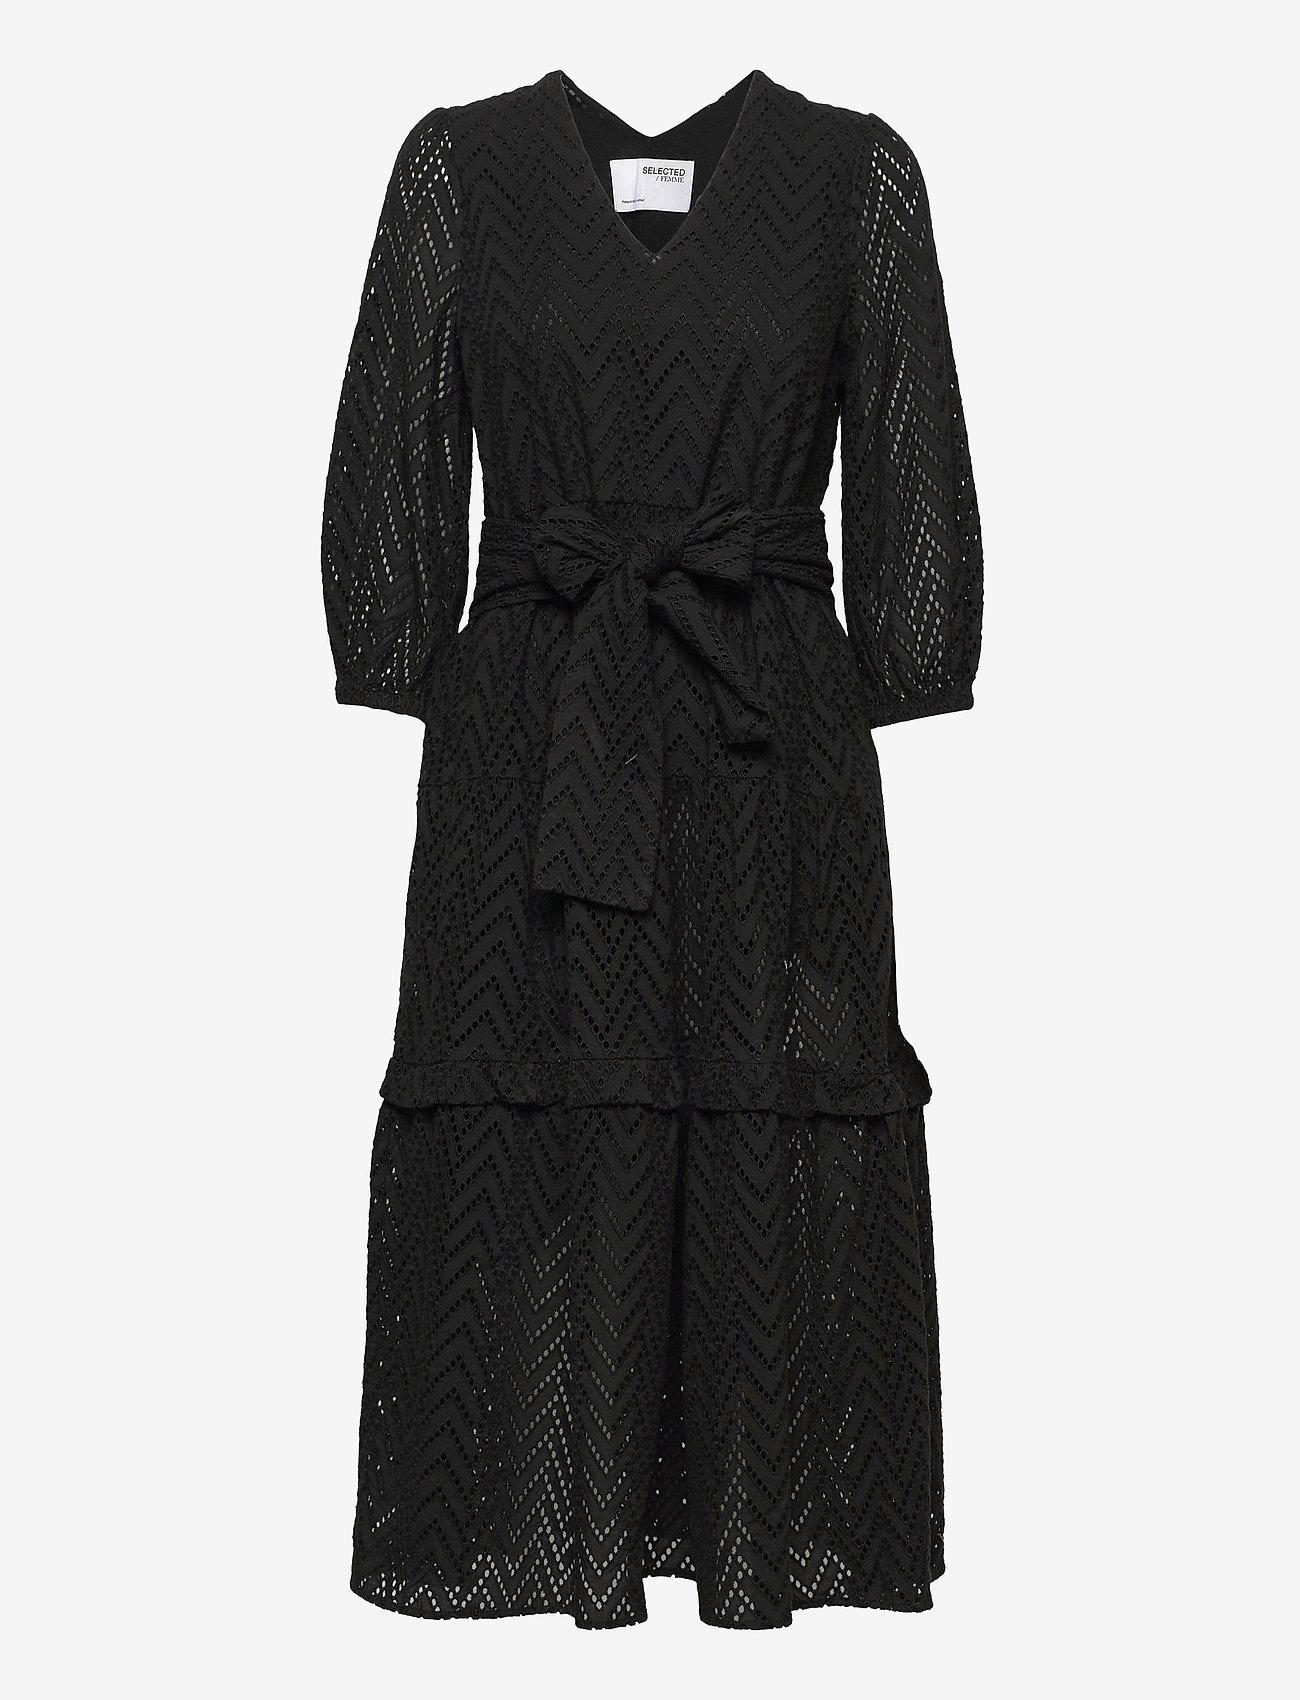 Selected Femme - SLFCECE-SADIE 3/4 MIDI DRESS - midi dresses - black - 0